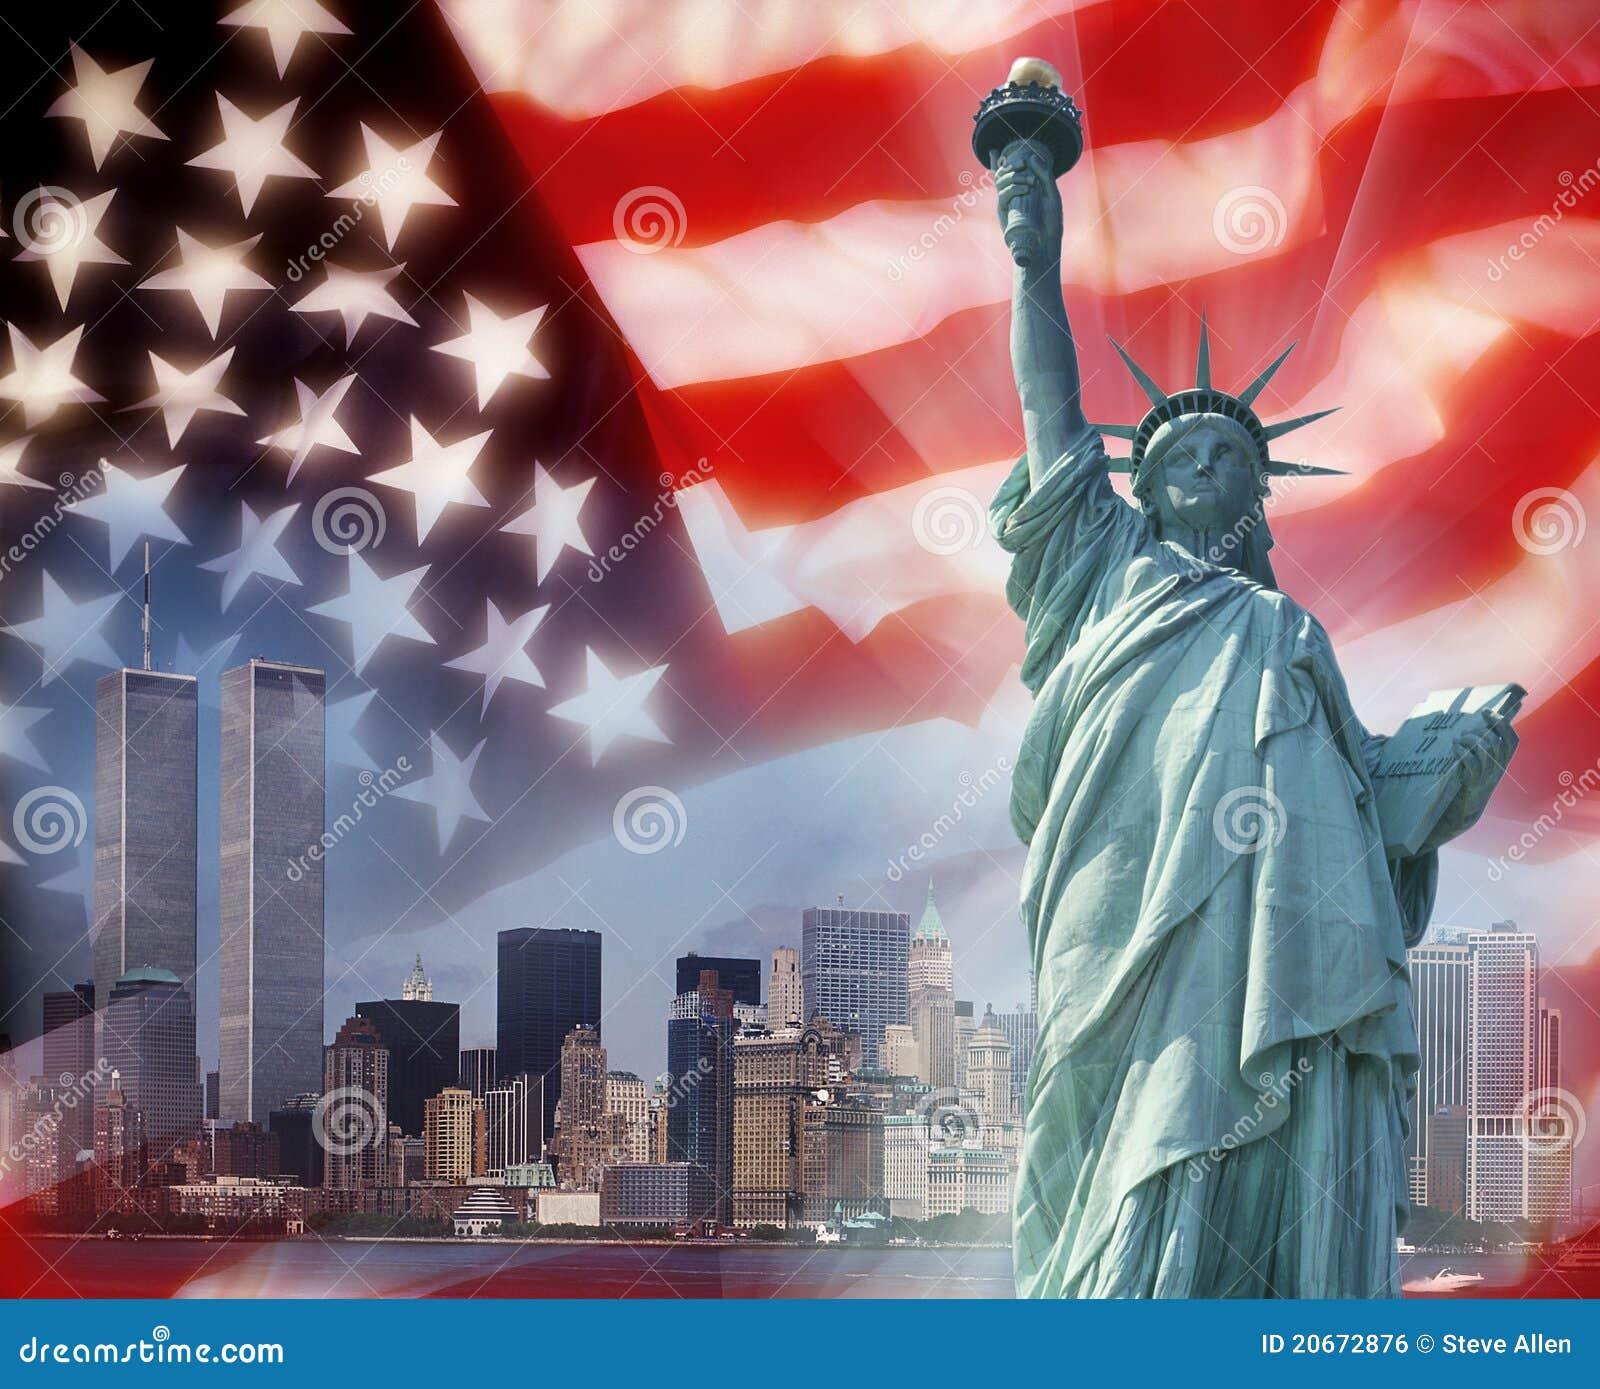 American Symbols Of Patriotism York - Patriotic Symbols